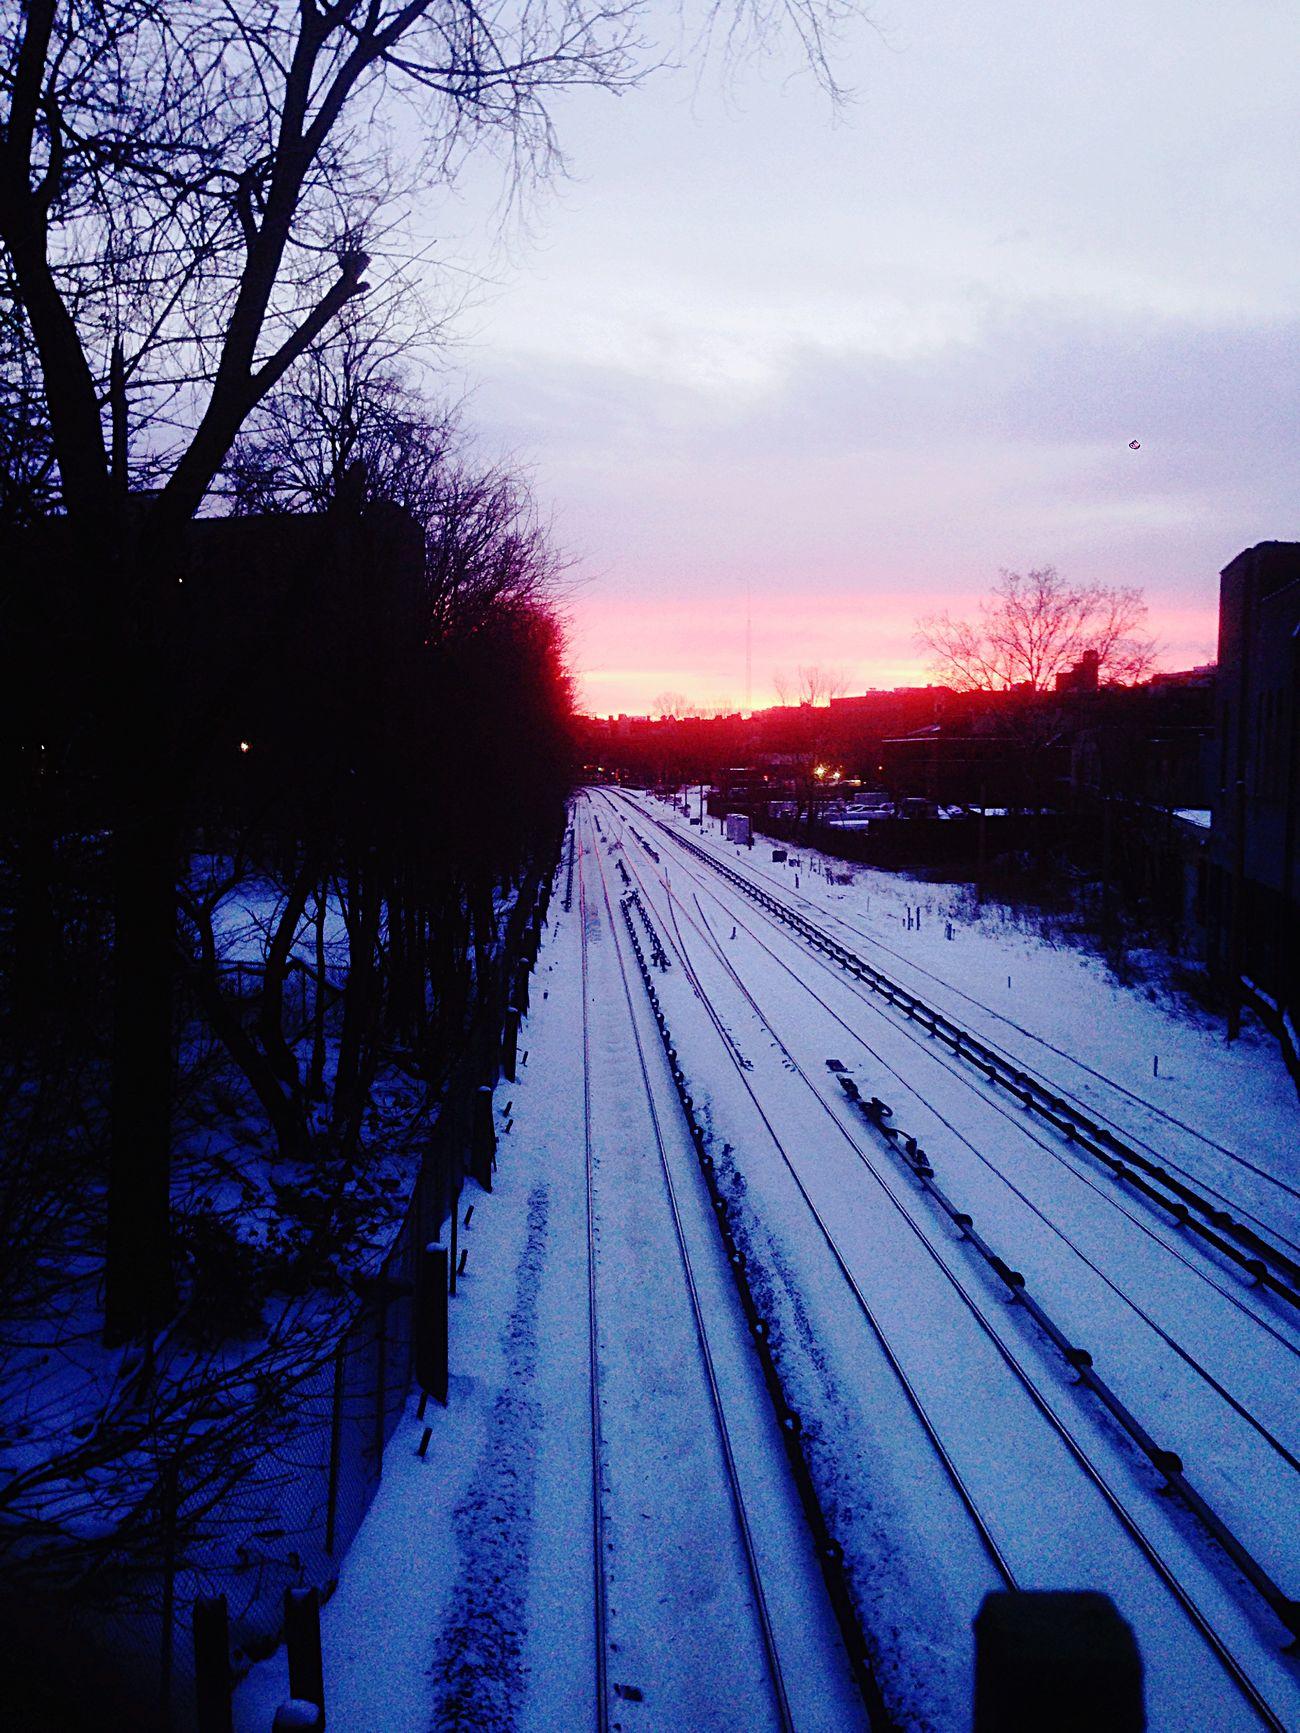 Snowy Sunset Beautiful Scenery